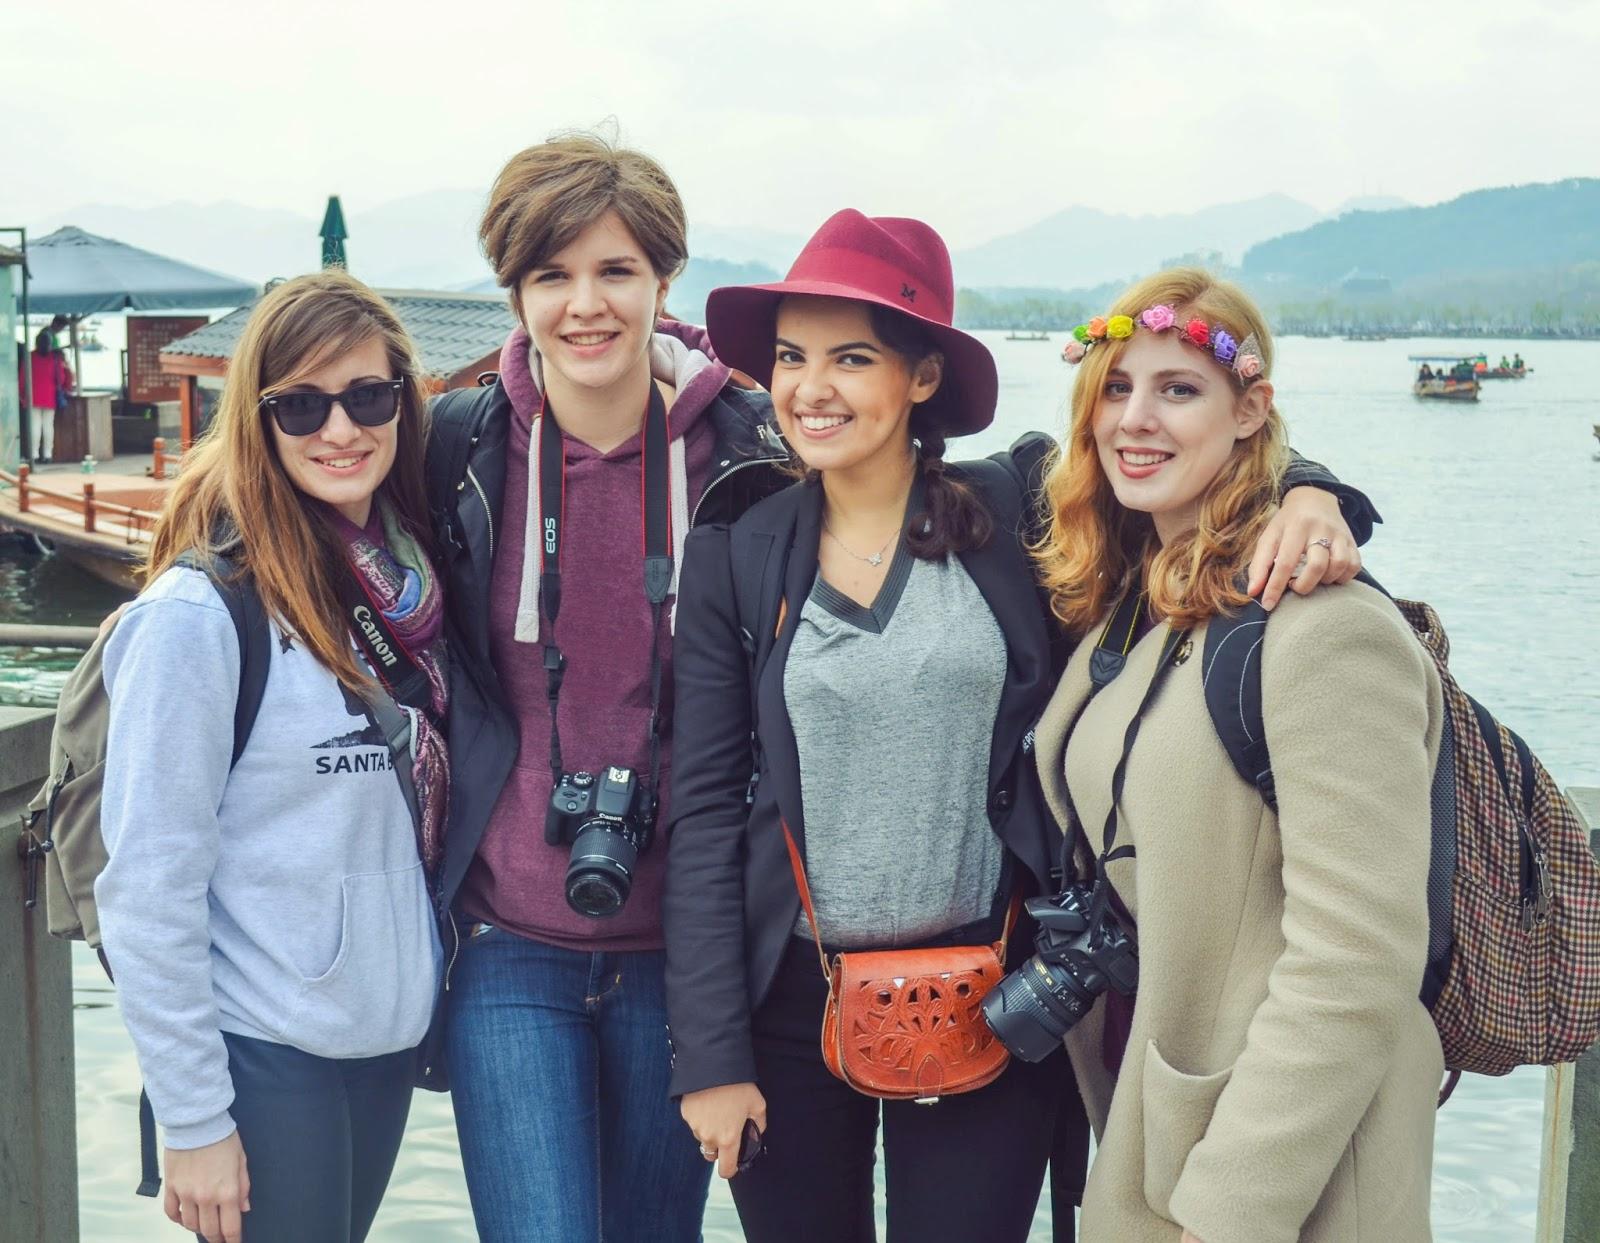 Malak and her friends in Hangzhou, China